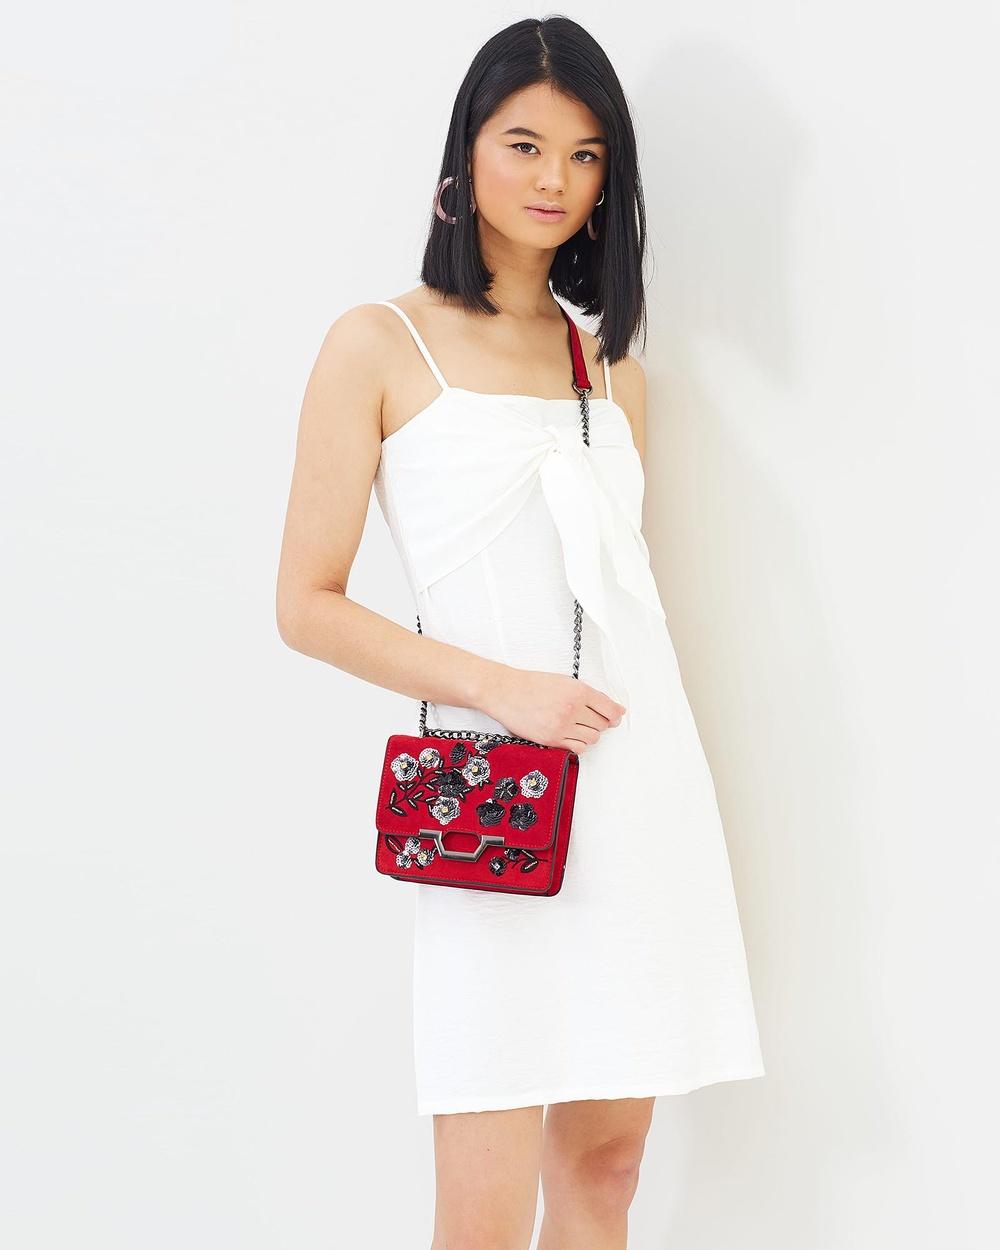 Otto Mode Prism Tie Dress Dresses White Prism Tie Dress